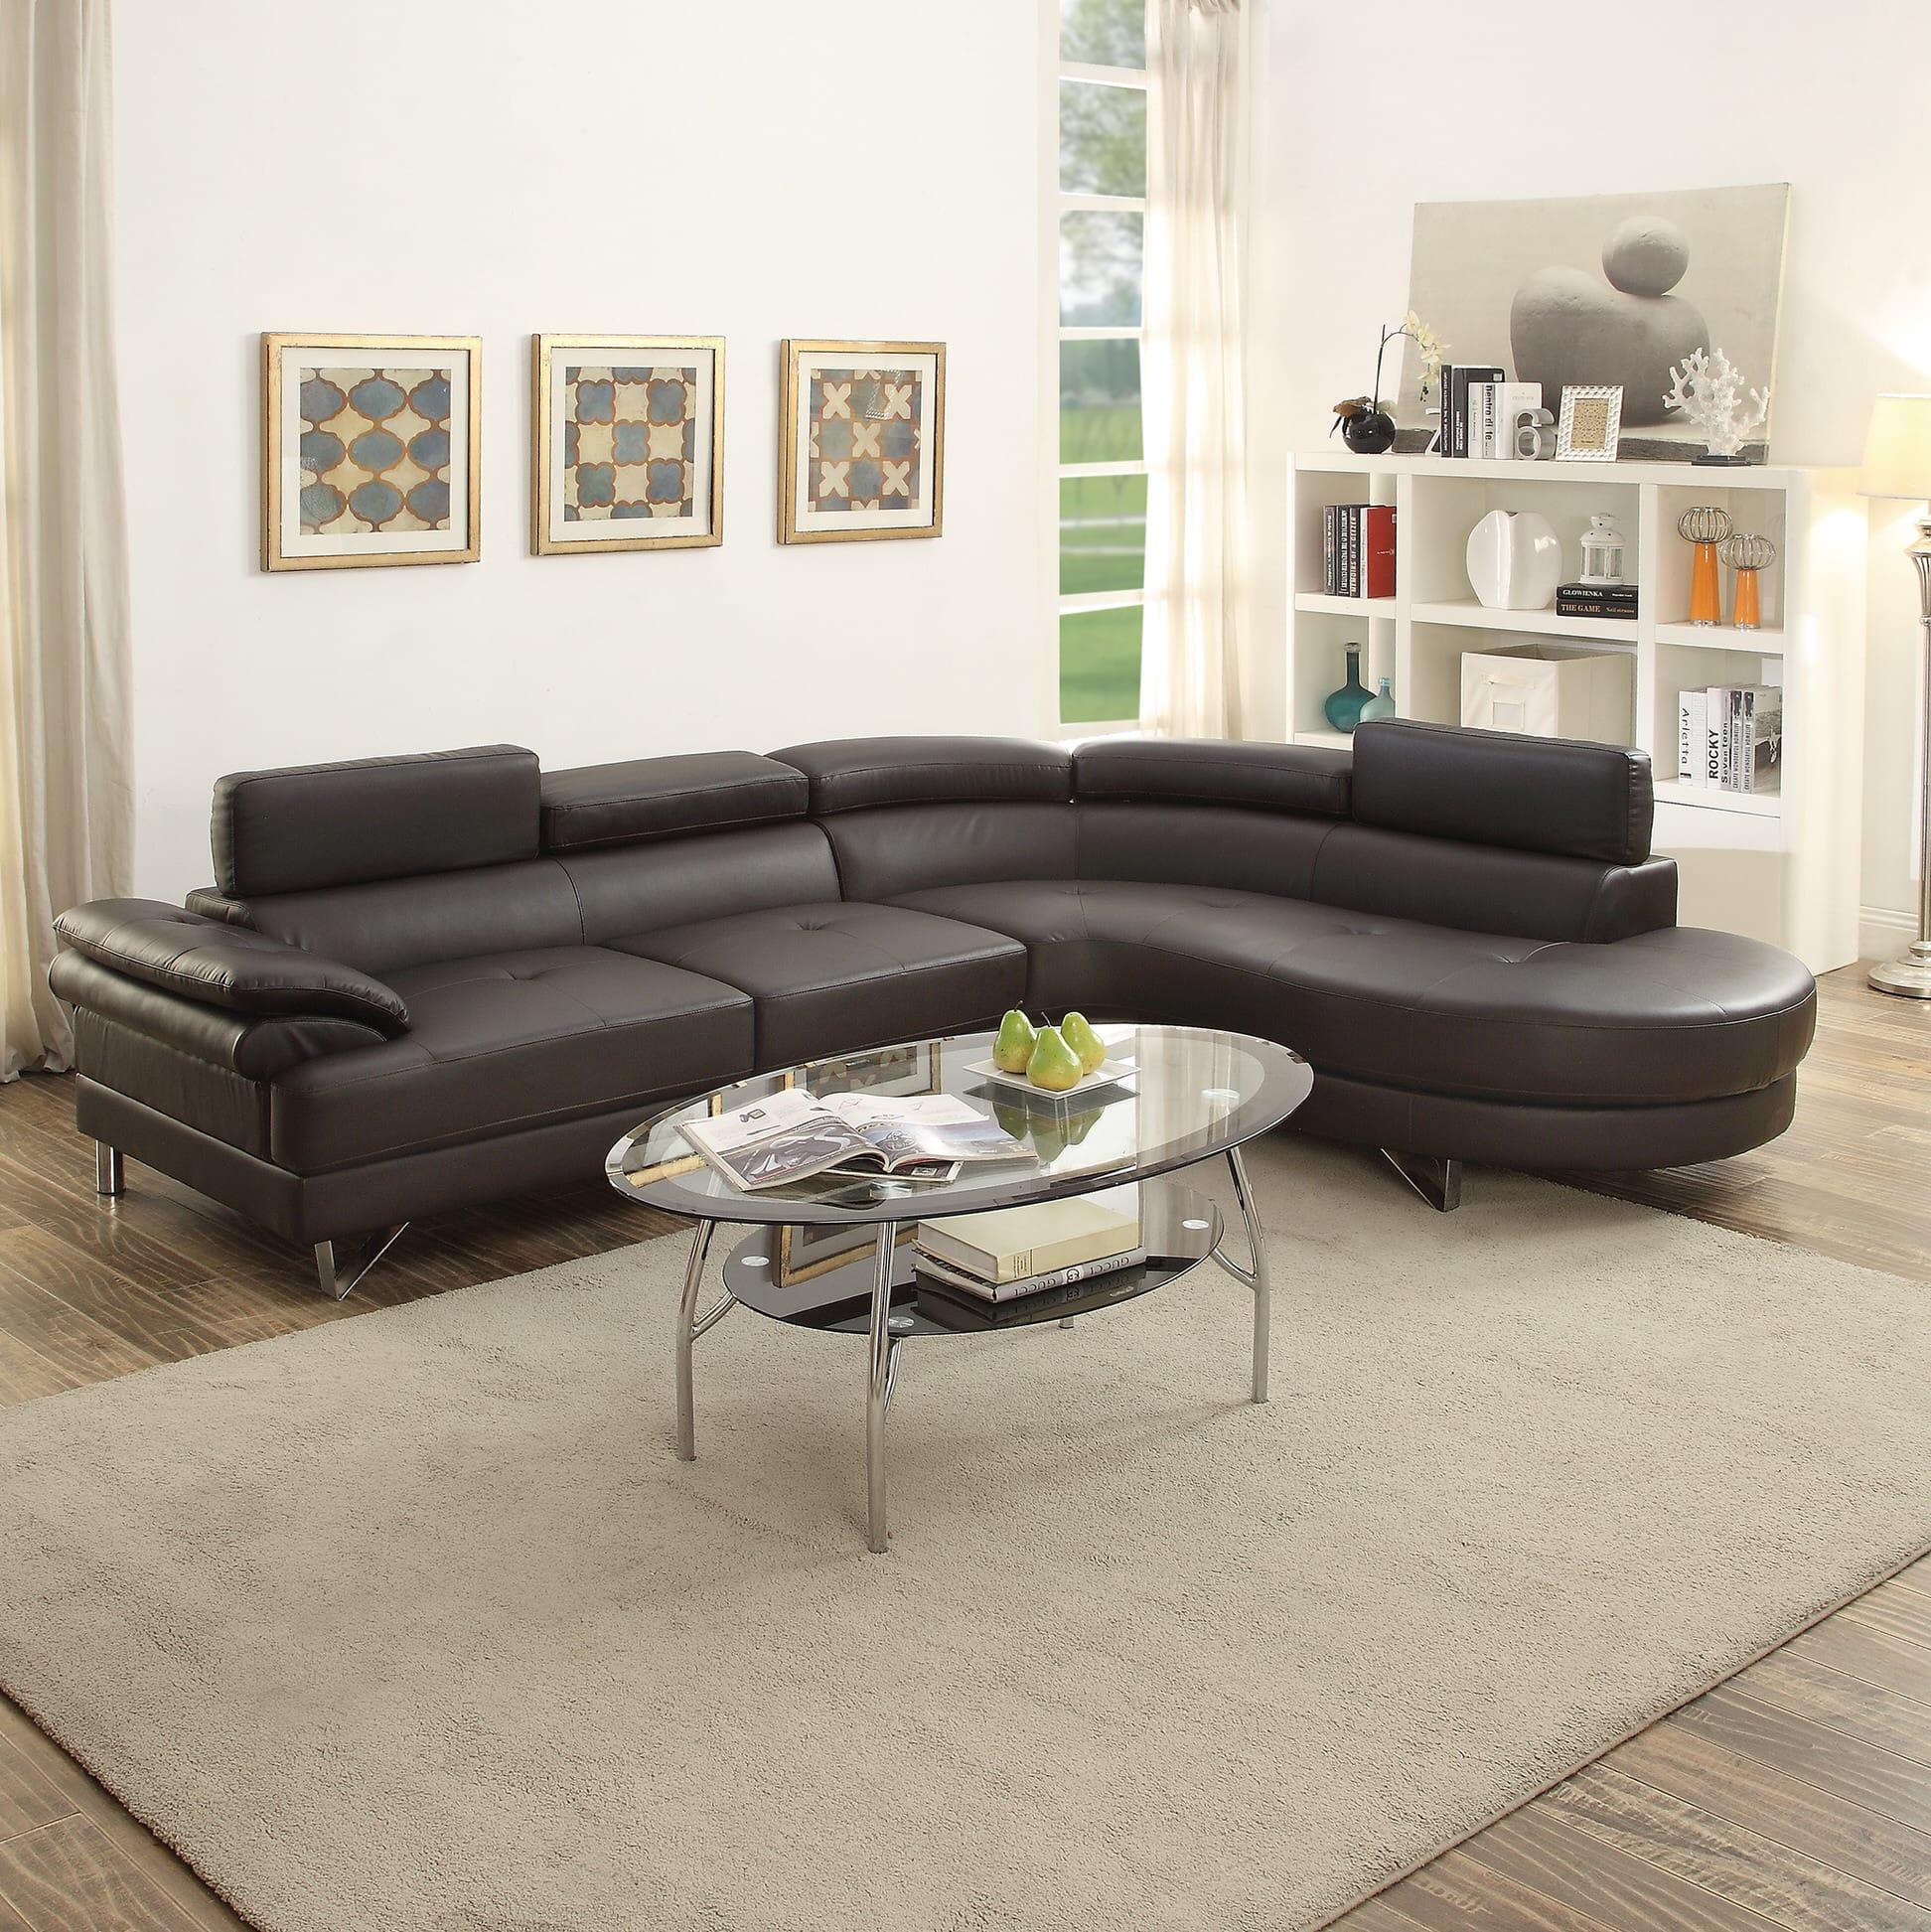 f6969 espresso 2 pcs sectional sofa set by poundex